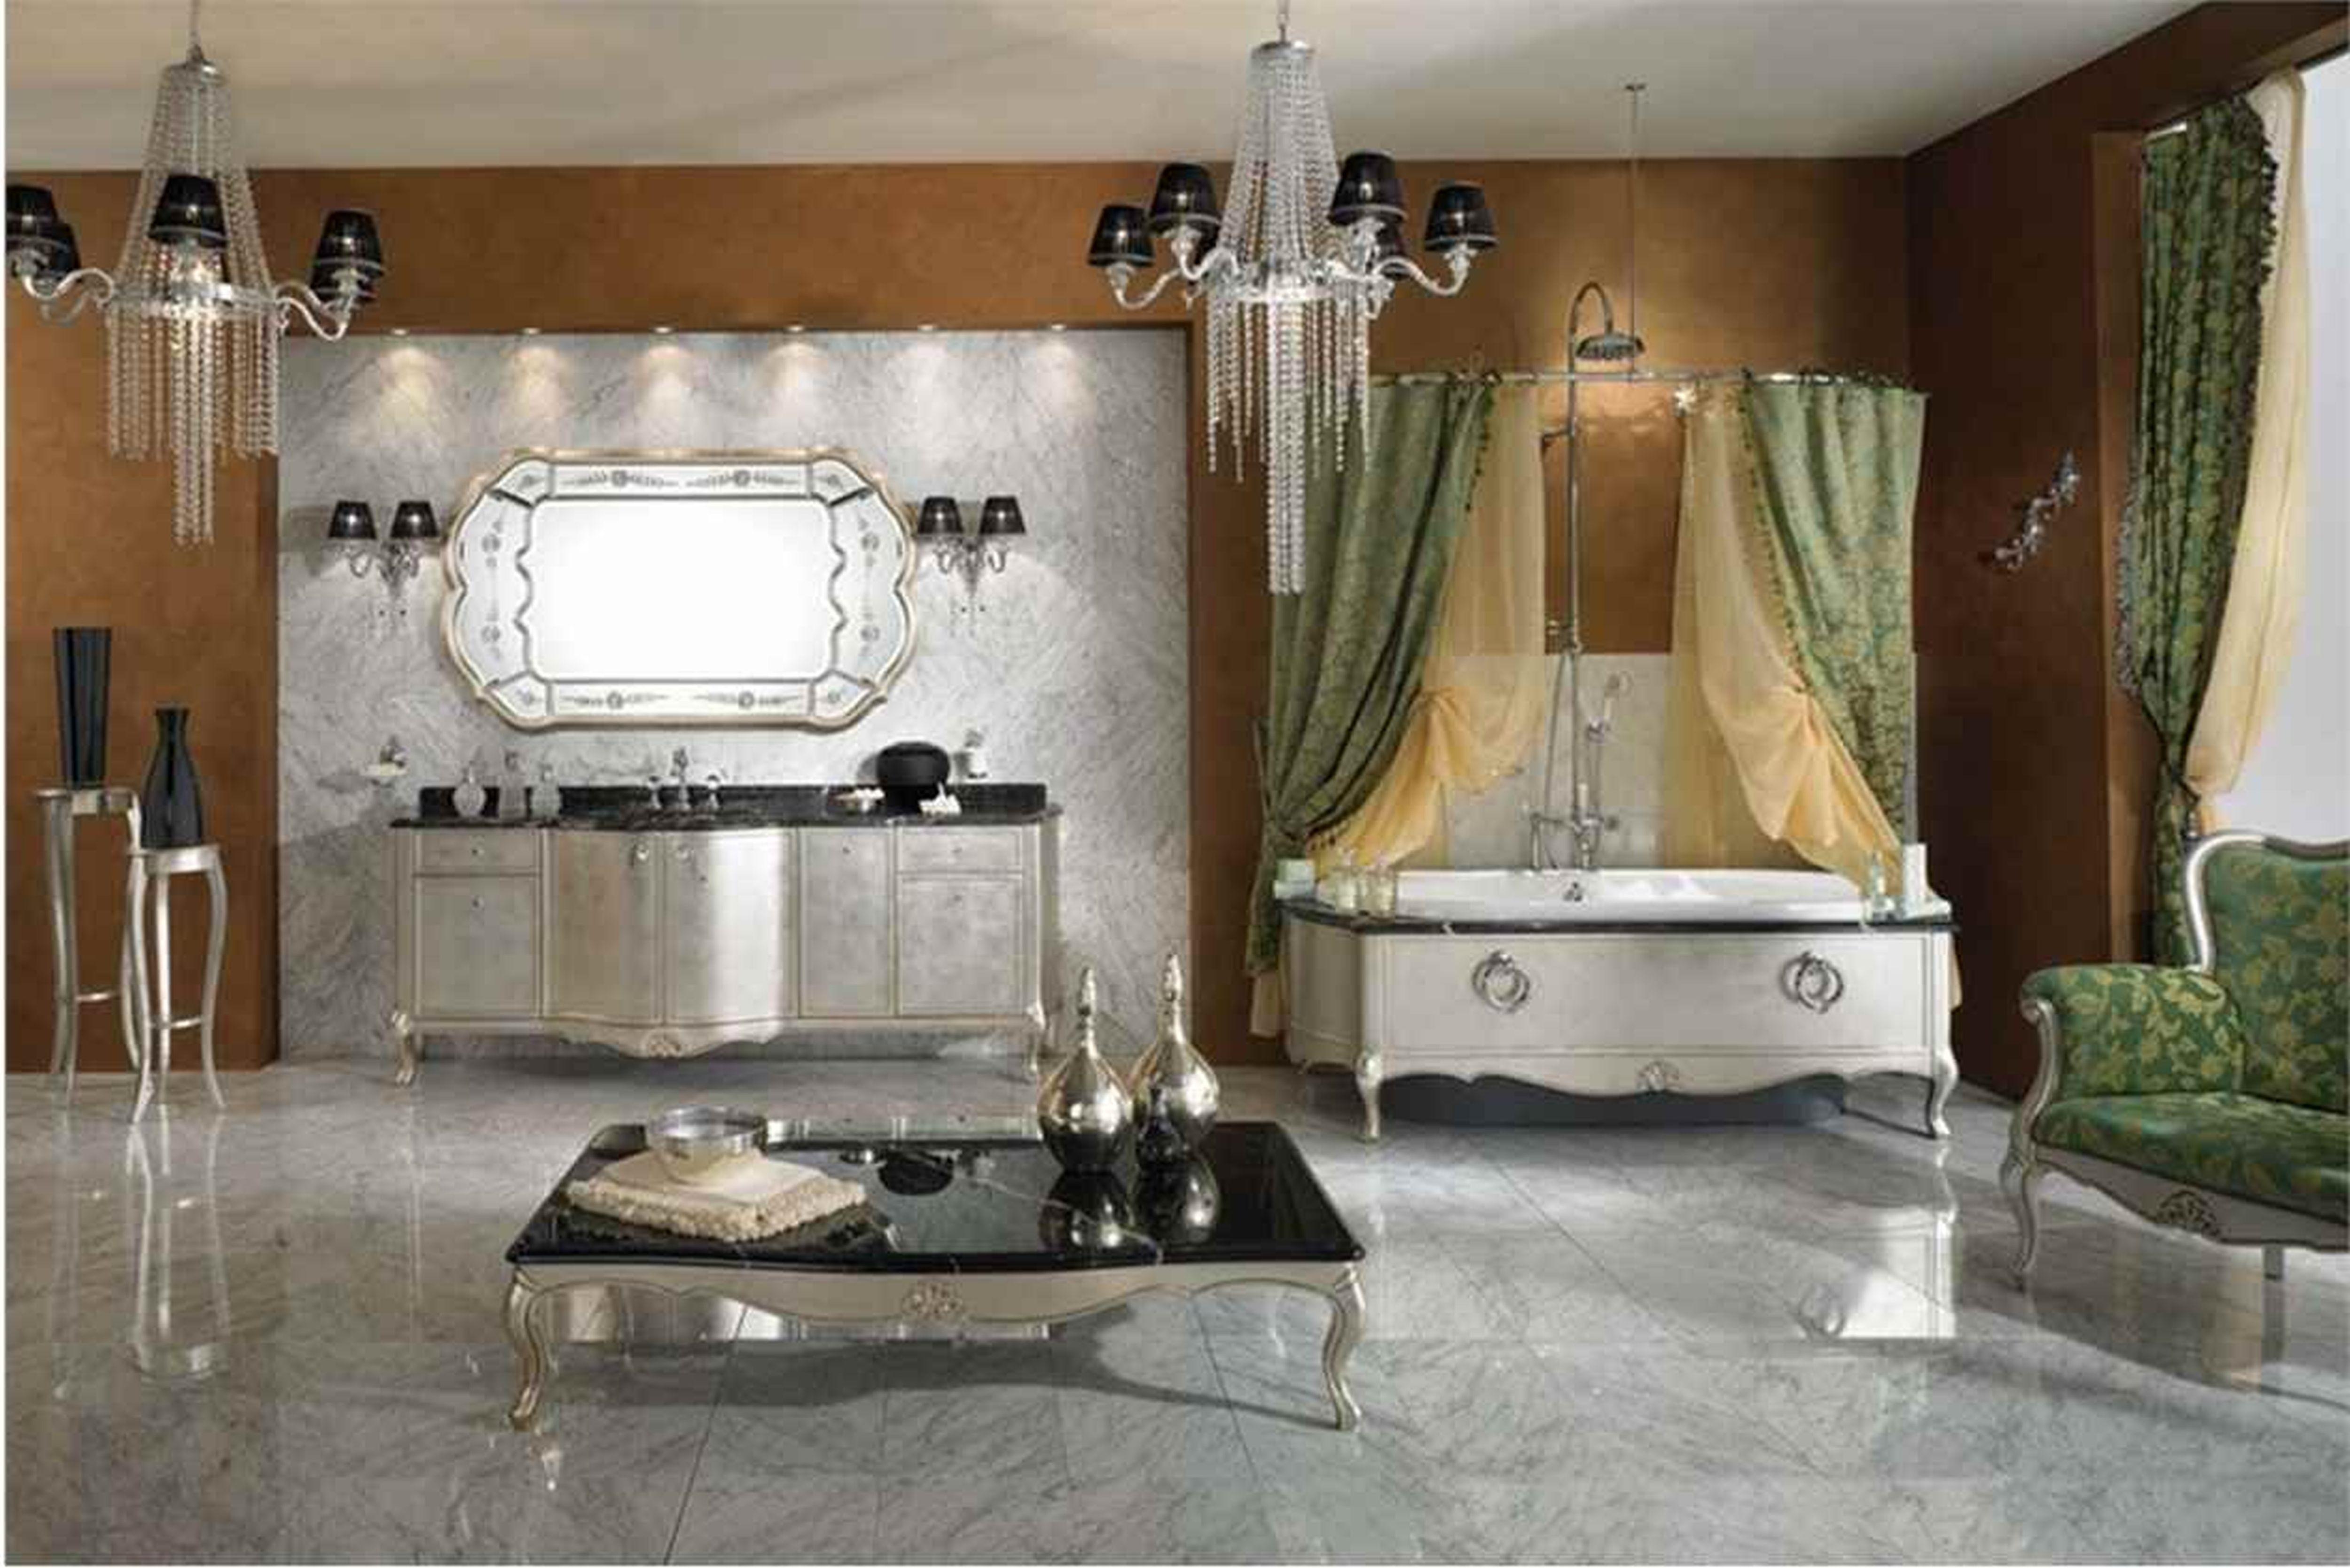 Bathroom Extraordinary Modern Country Bathroom Idea With Classic Regarding Crystal Bathroom Chandelier (Image 9 of 15)